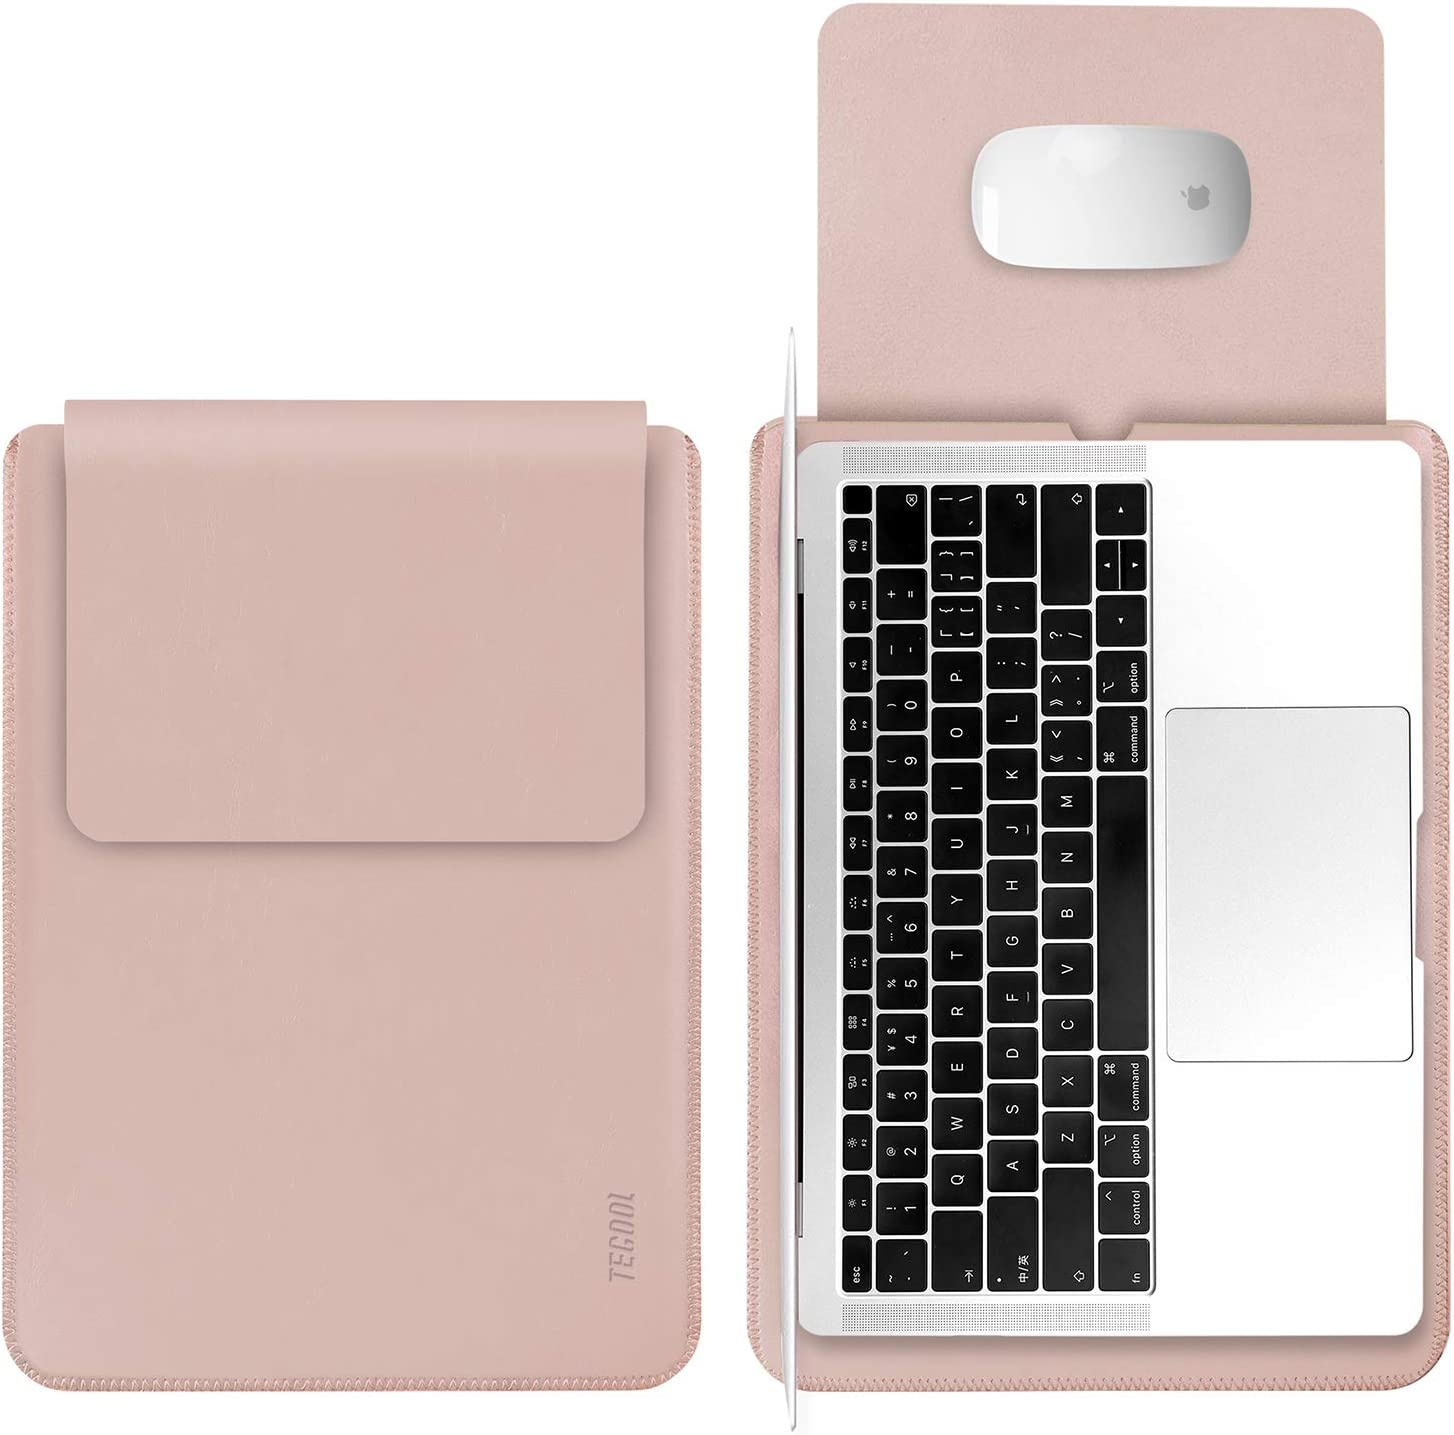 TECOOL 13 Pulgadas Funda Portátil, Funda de Cuero Protectora Bolsa Ordenador Laptop Sleeve para MacBook Air 13 / MacBook Pro 13.3 Retina, 13.5 Surface Laptop 1 2 3, MateBook D 14, DELL XPS 13 - Rosa